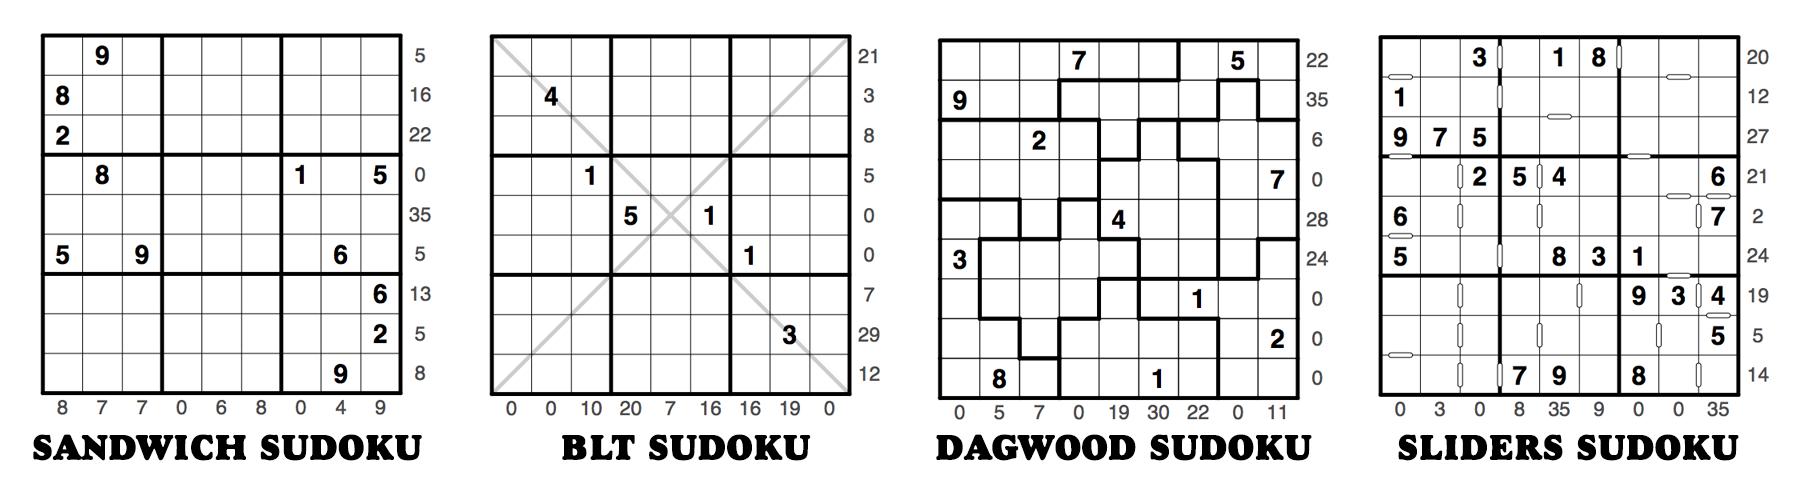 Sandwich Sudoku Puzzleskrazydad